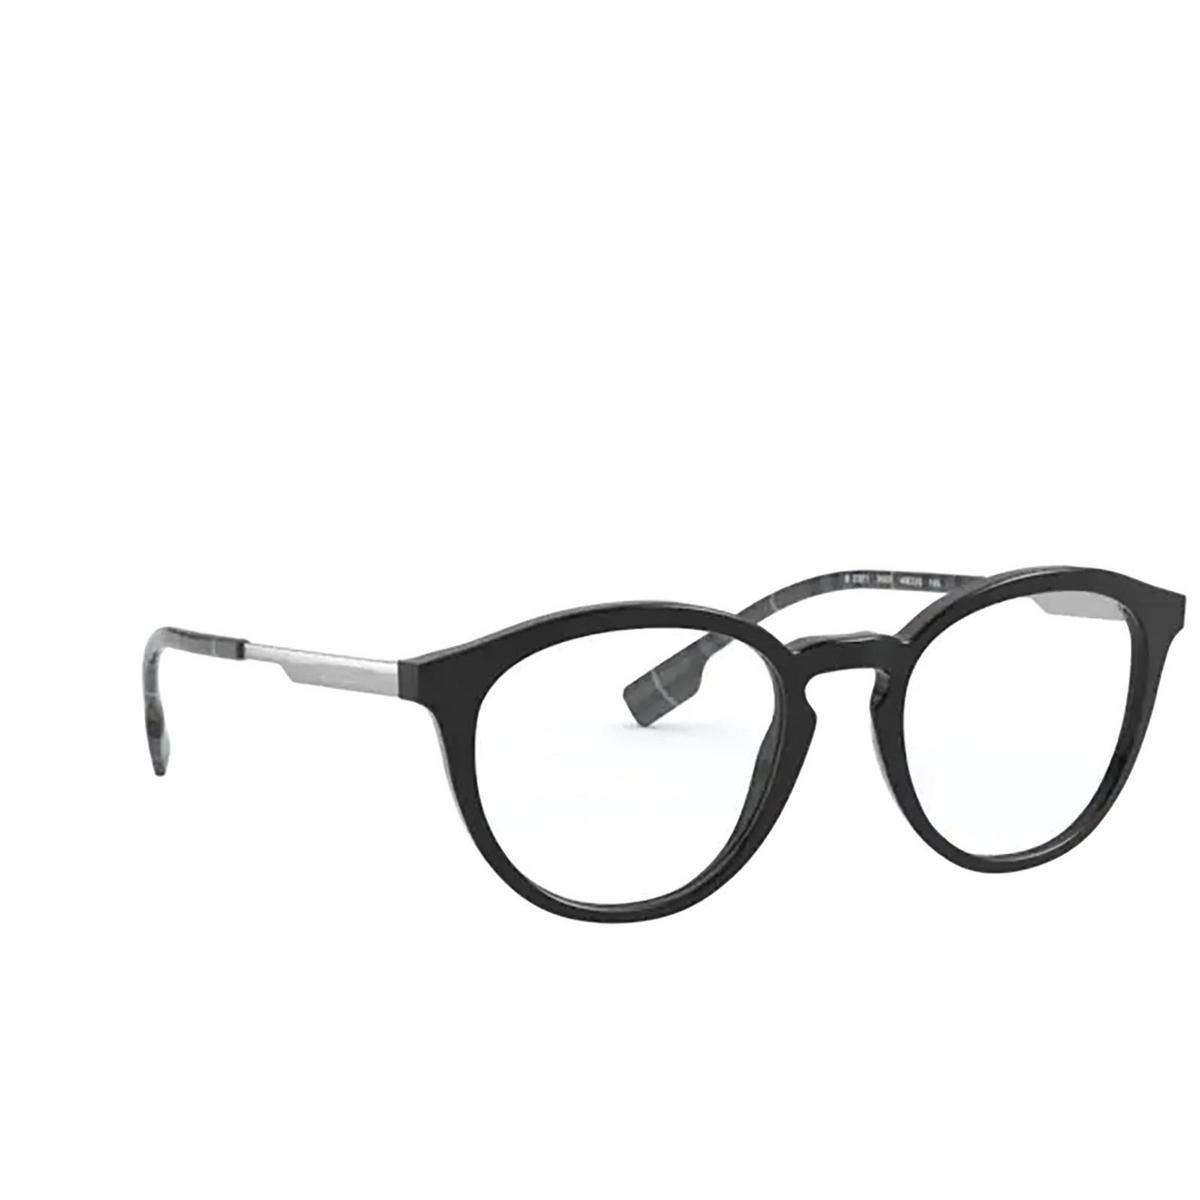 Burberry® Round Eyeglasses: Keats BE2321 color Black 3001 - three-quarters view.